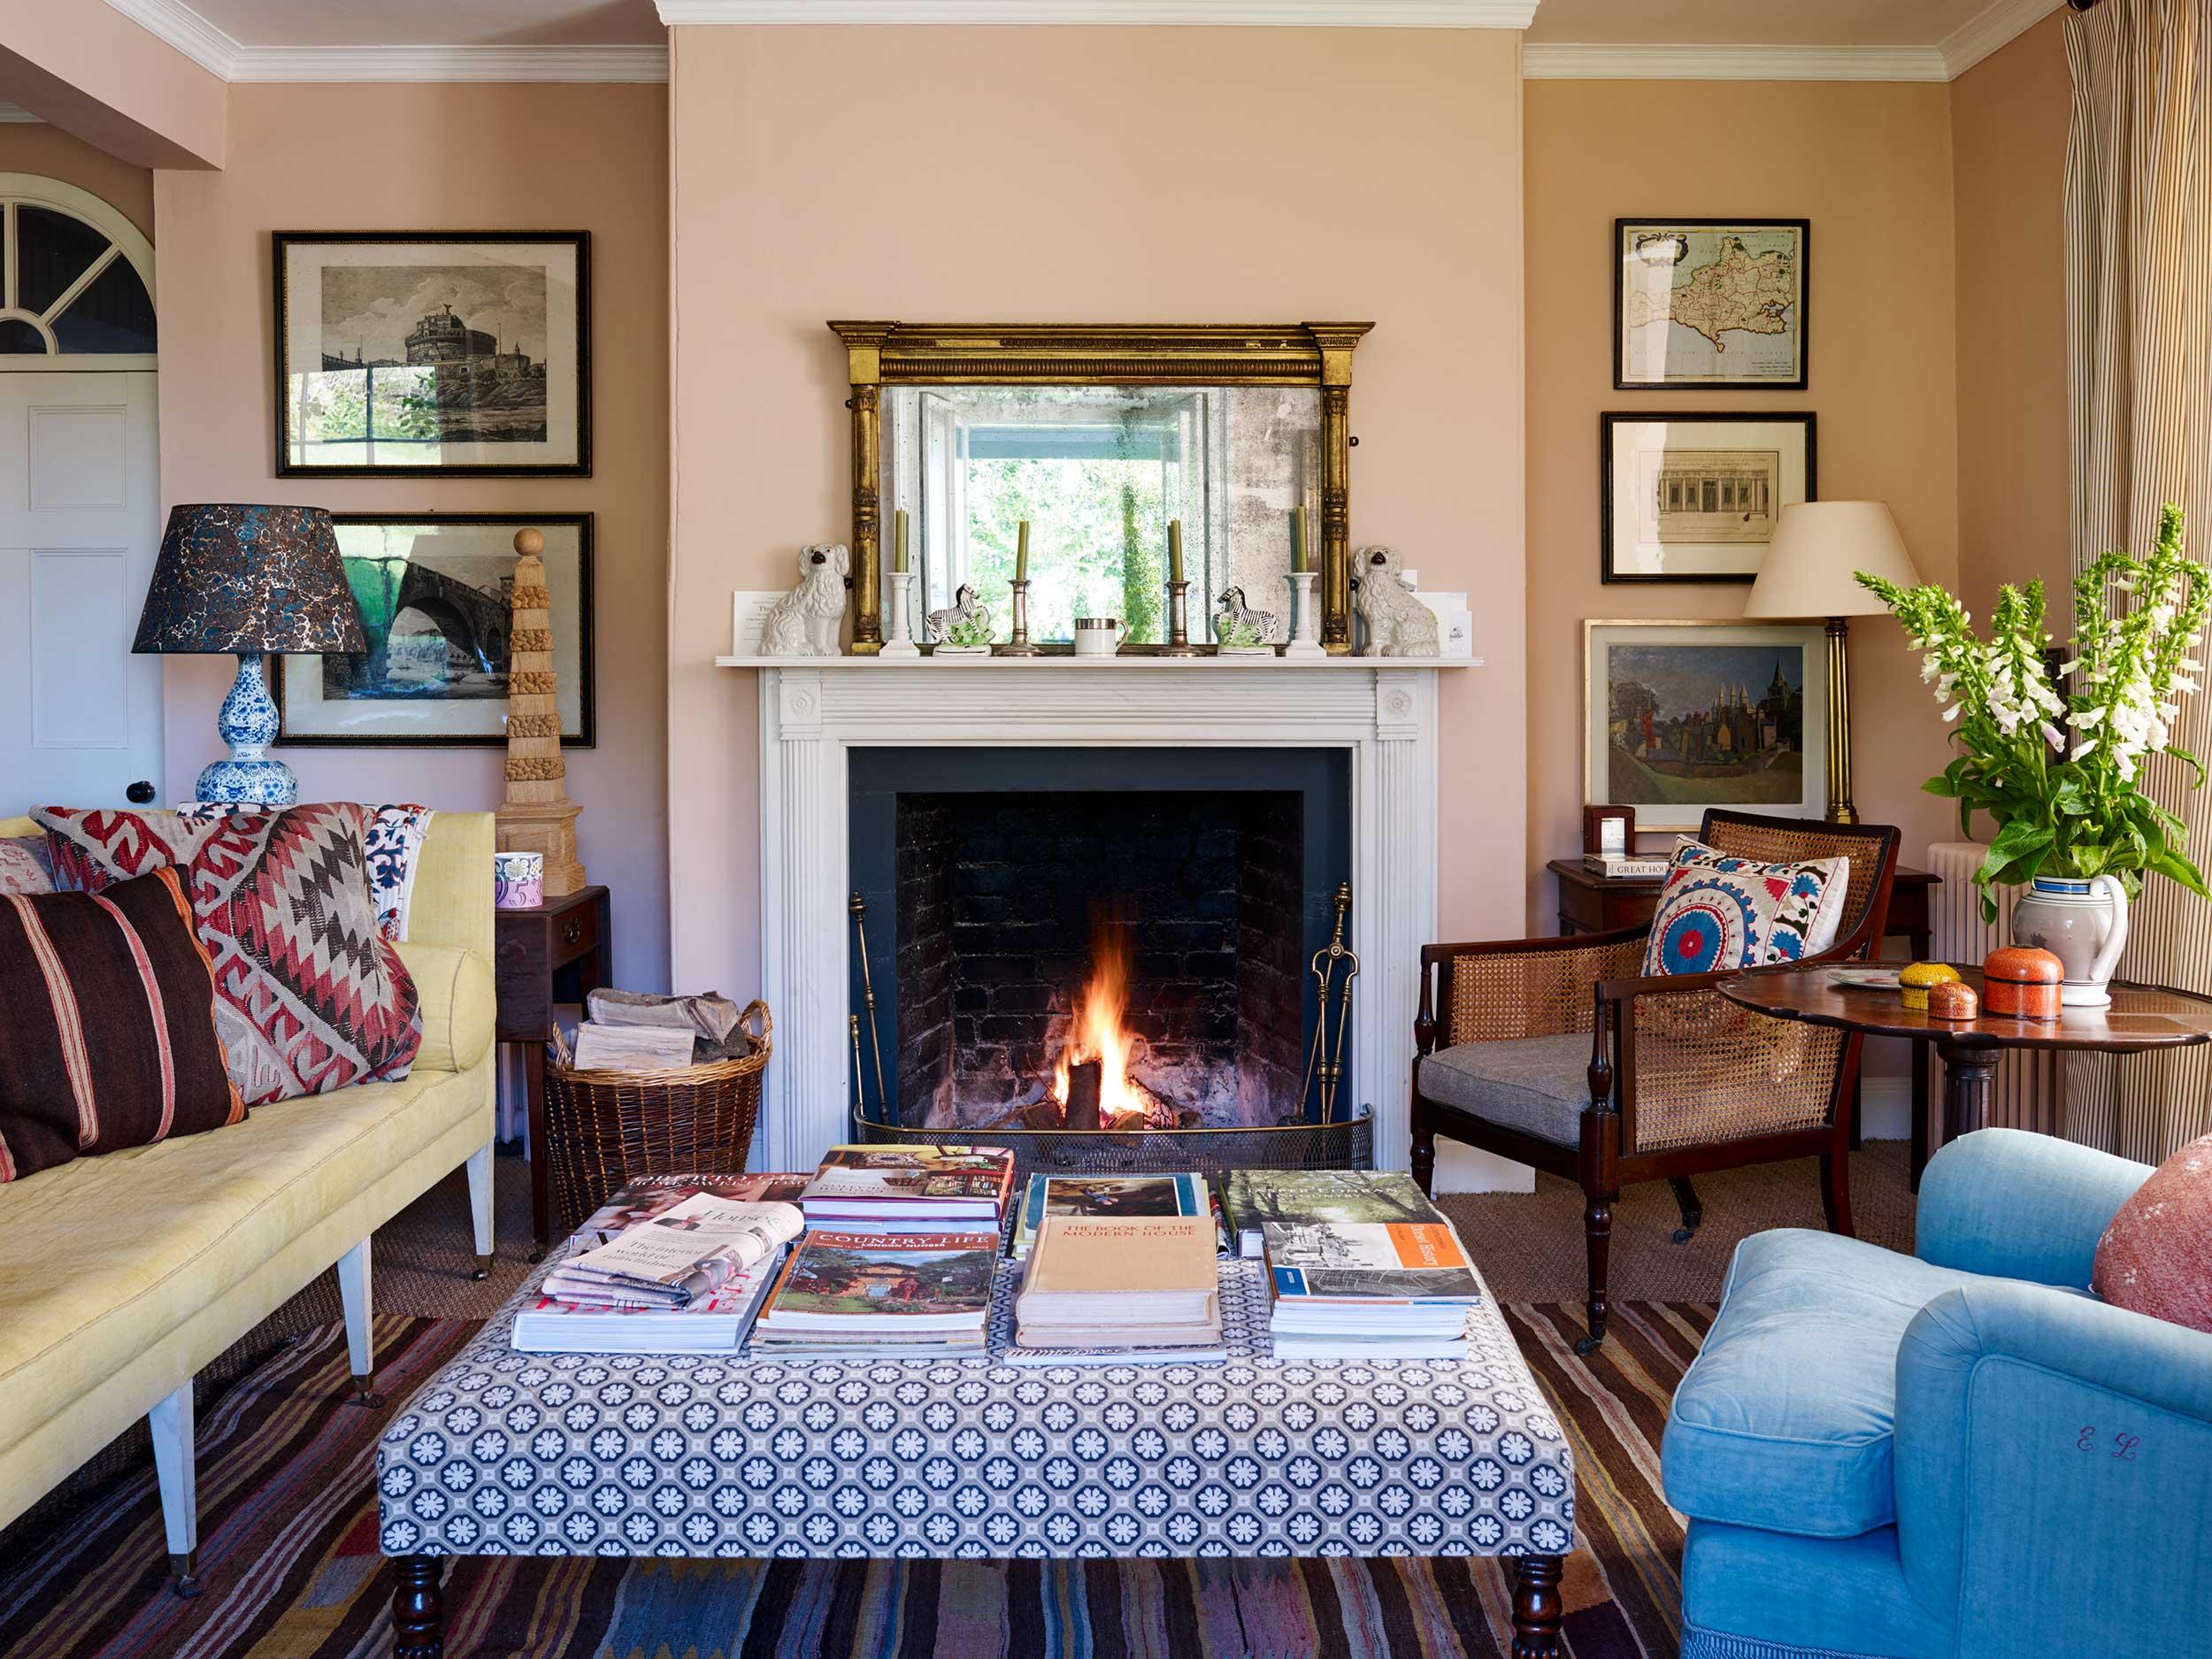 The old parsonage ben pentreath ltd for Home decor uk ltd